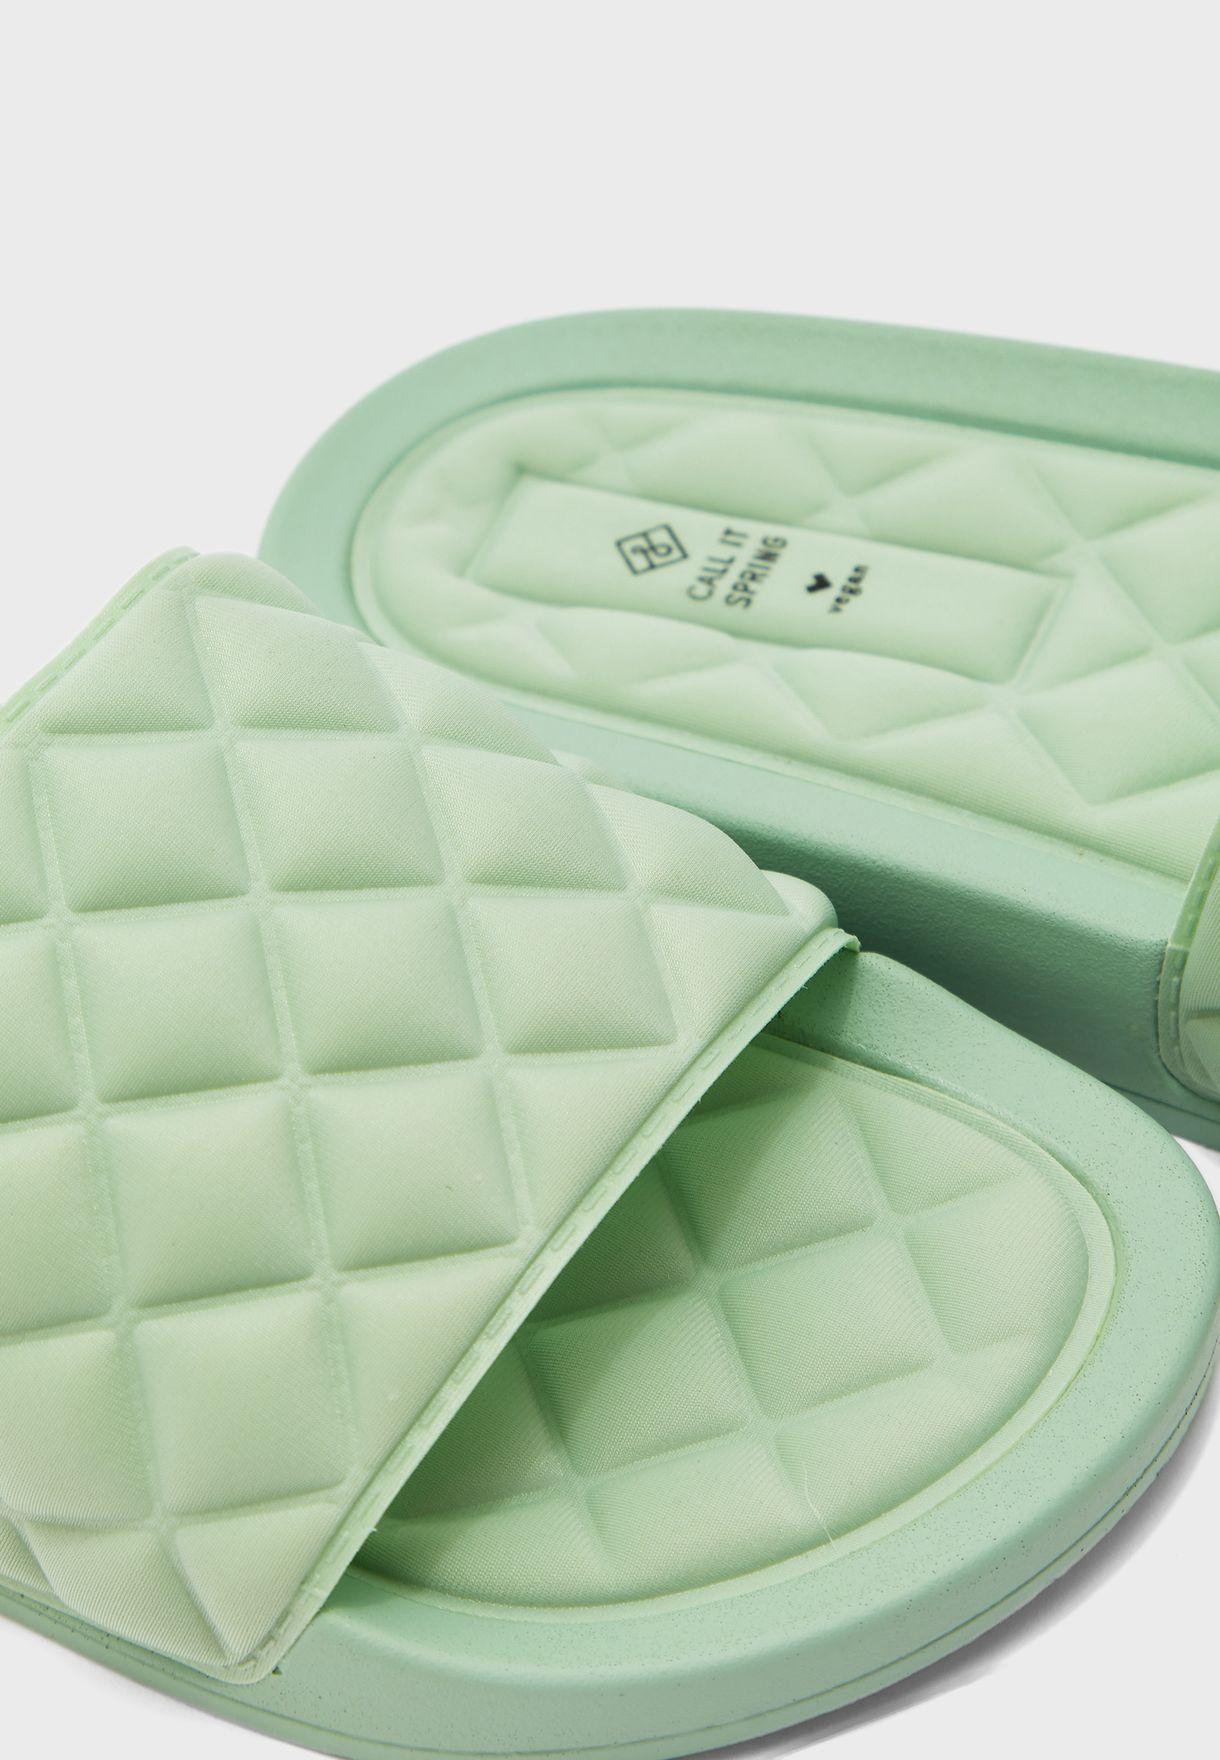 Kaeaniell Flat Sandals